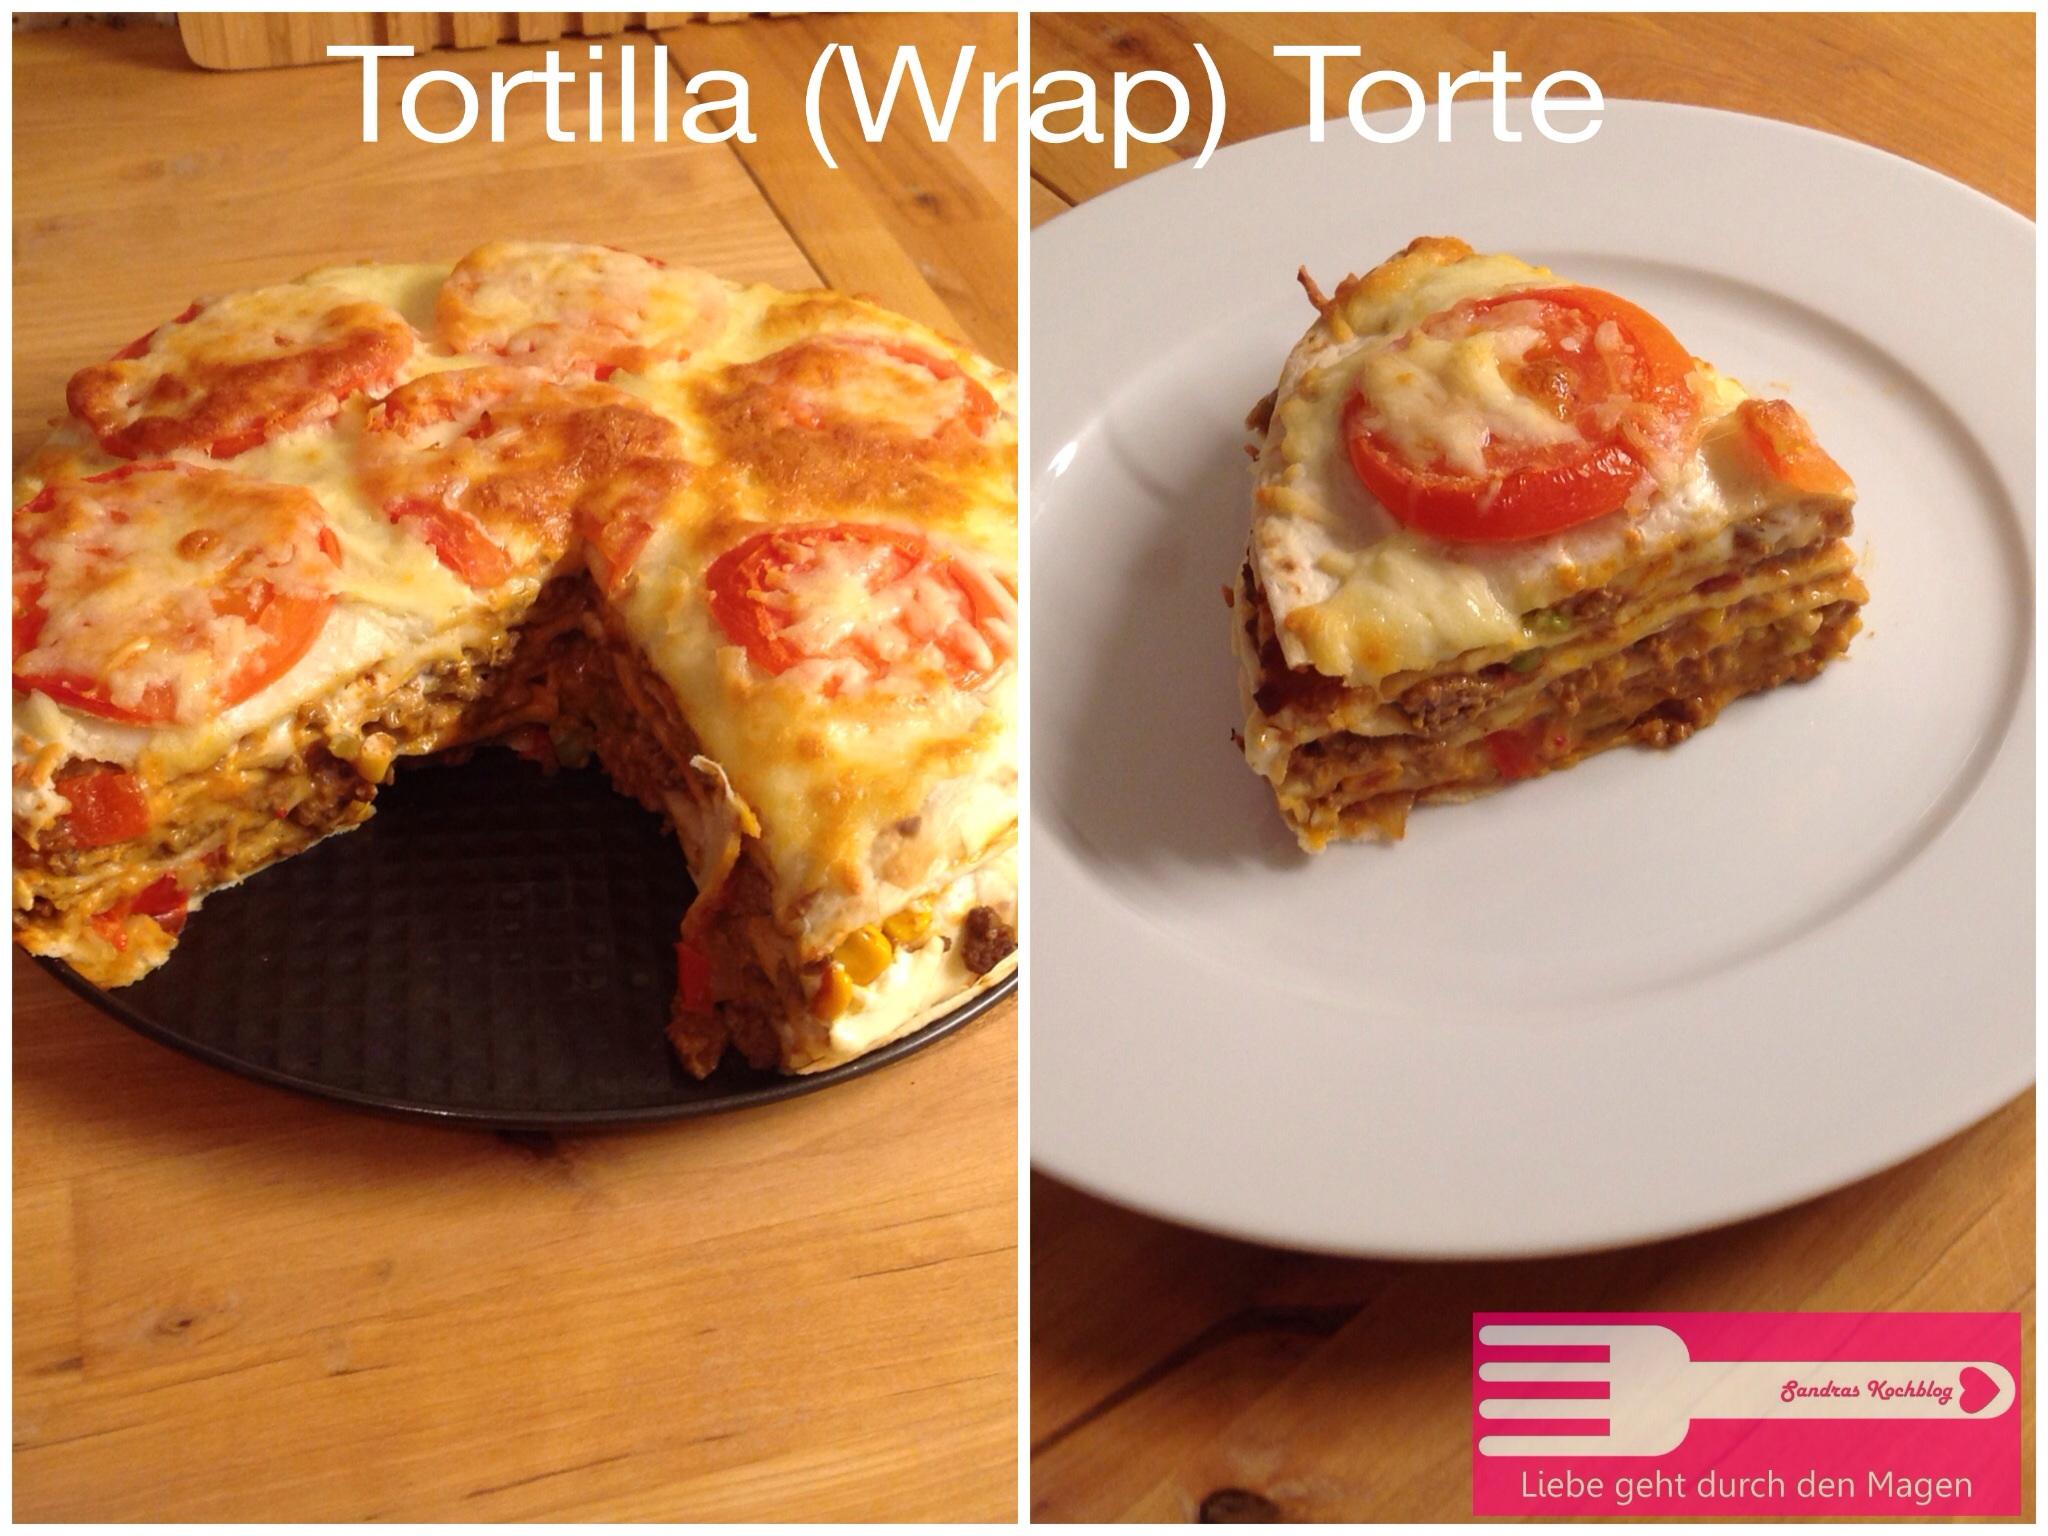 Tortilla Wrap Torte Sandras Kochblog